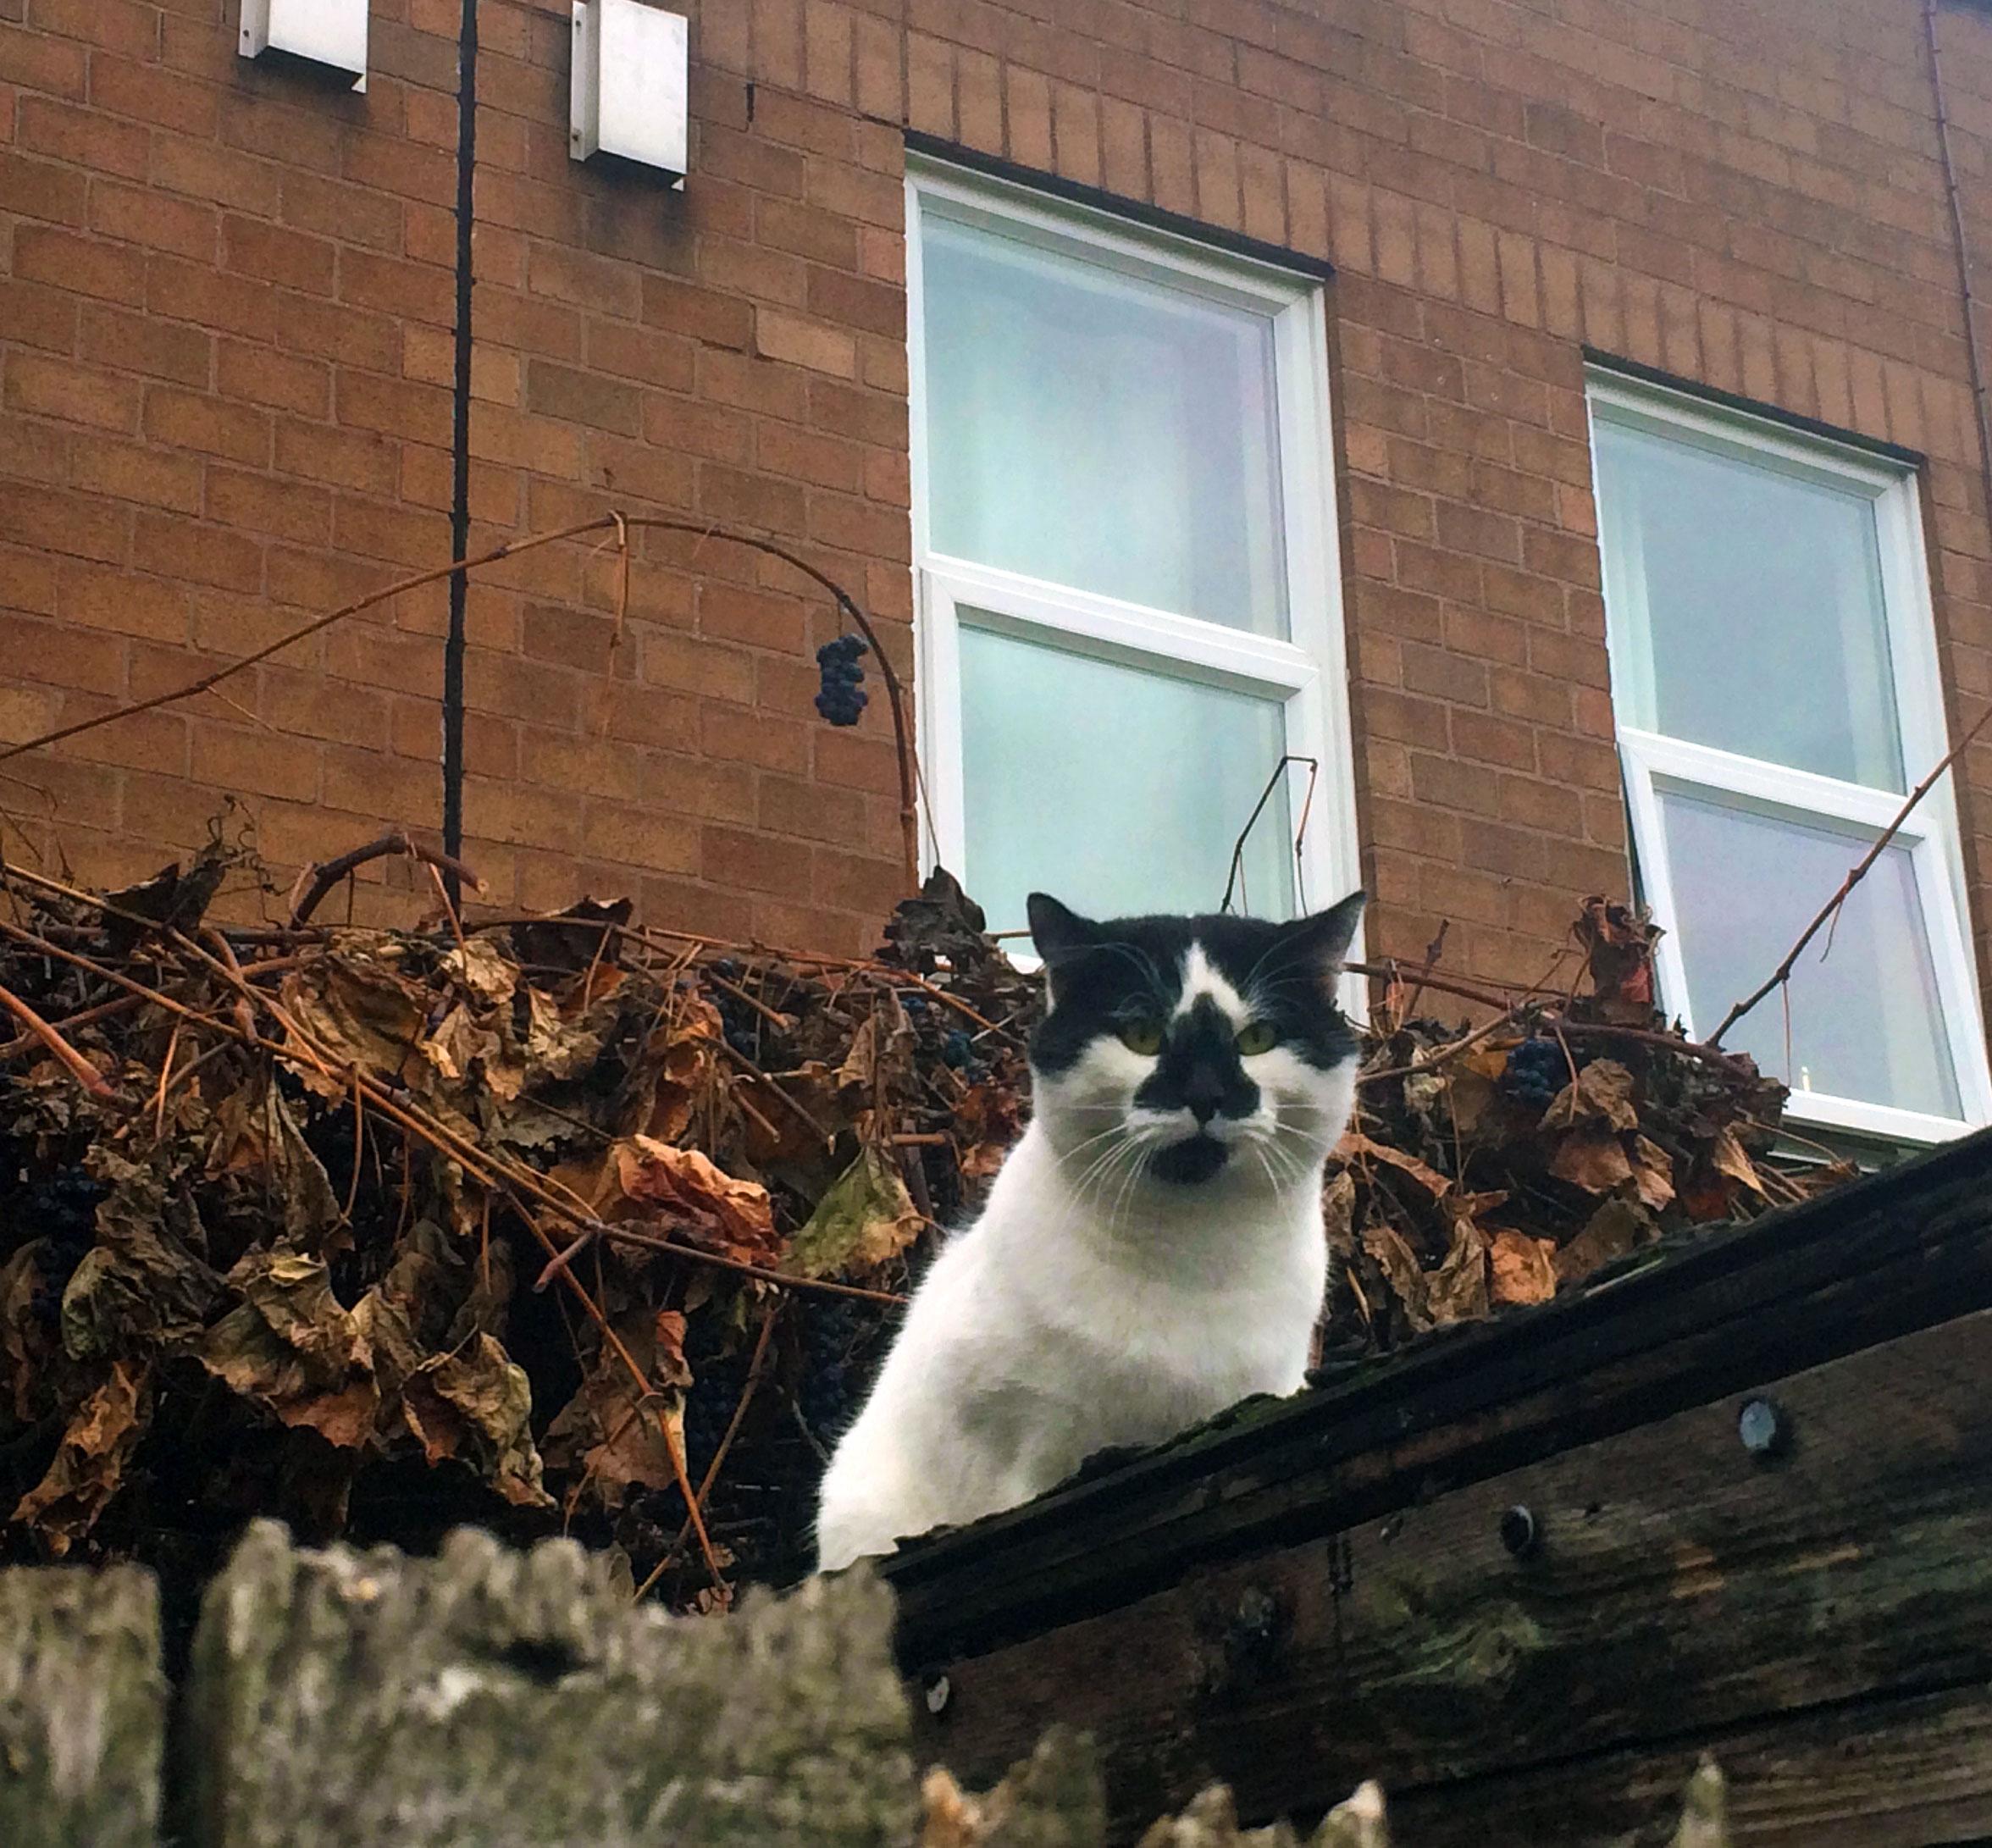 London cat - secondfloorflat.com